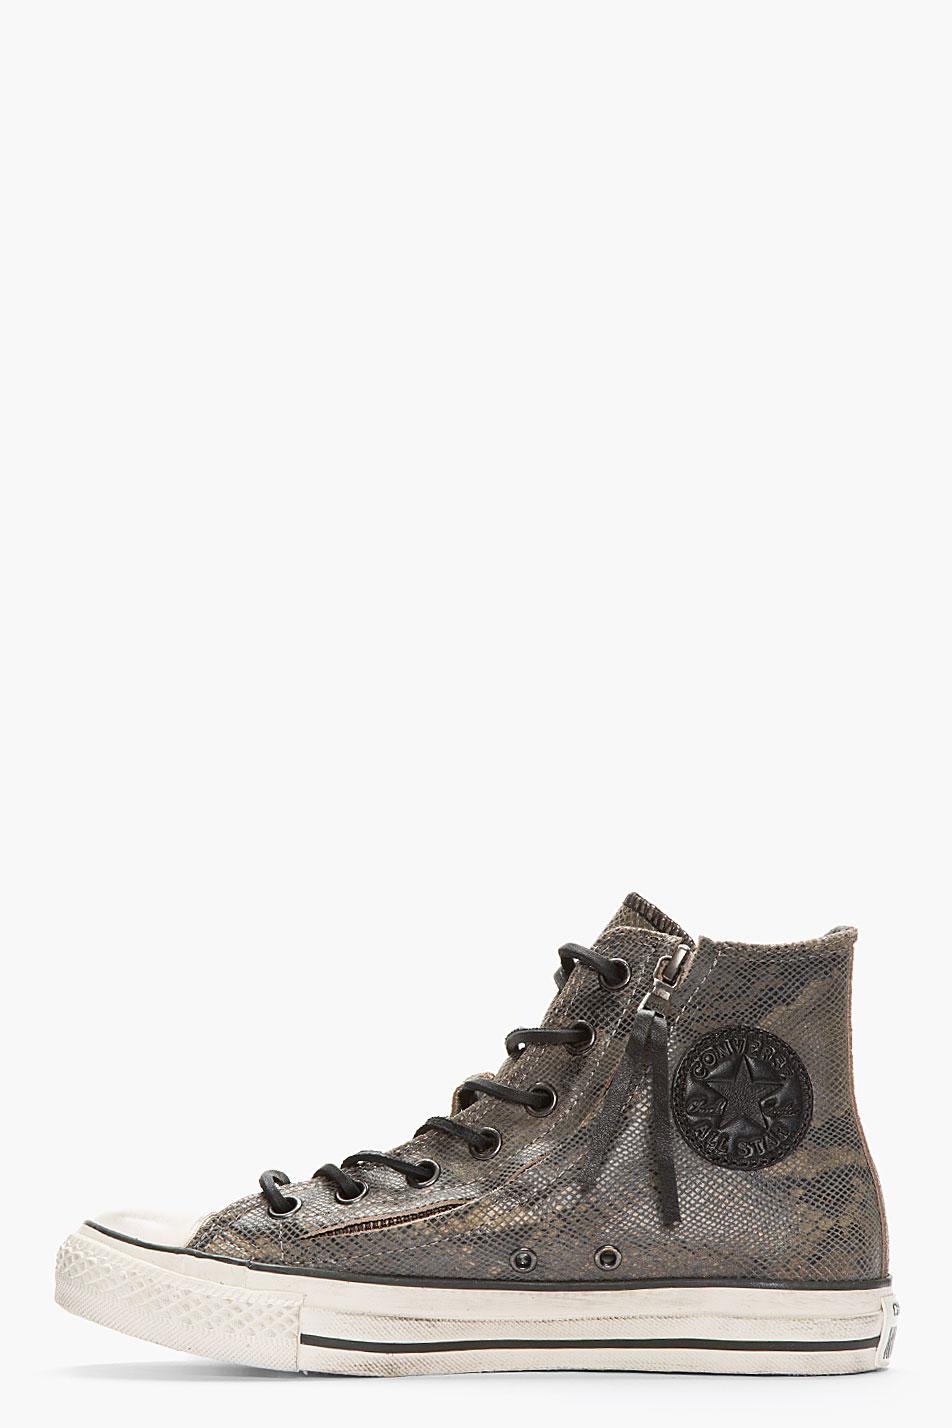 4d5d61c0cb6 Lyst - Converse Dark Grey Snakeskin Suede Zippered Converse X All ...